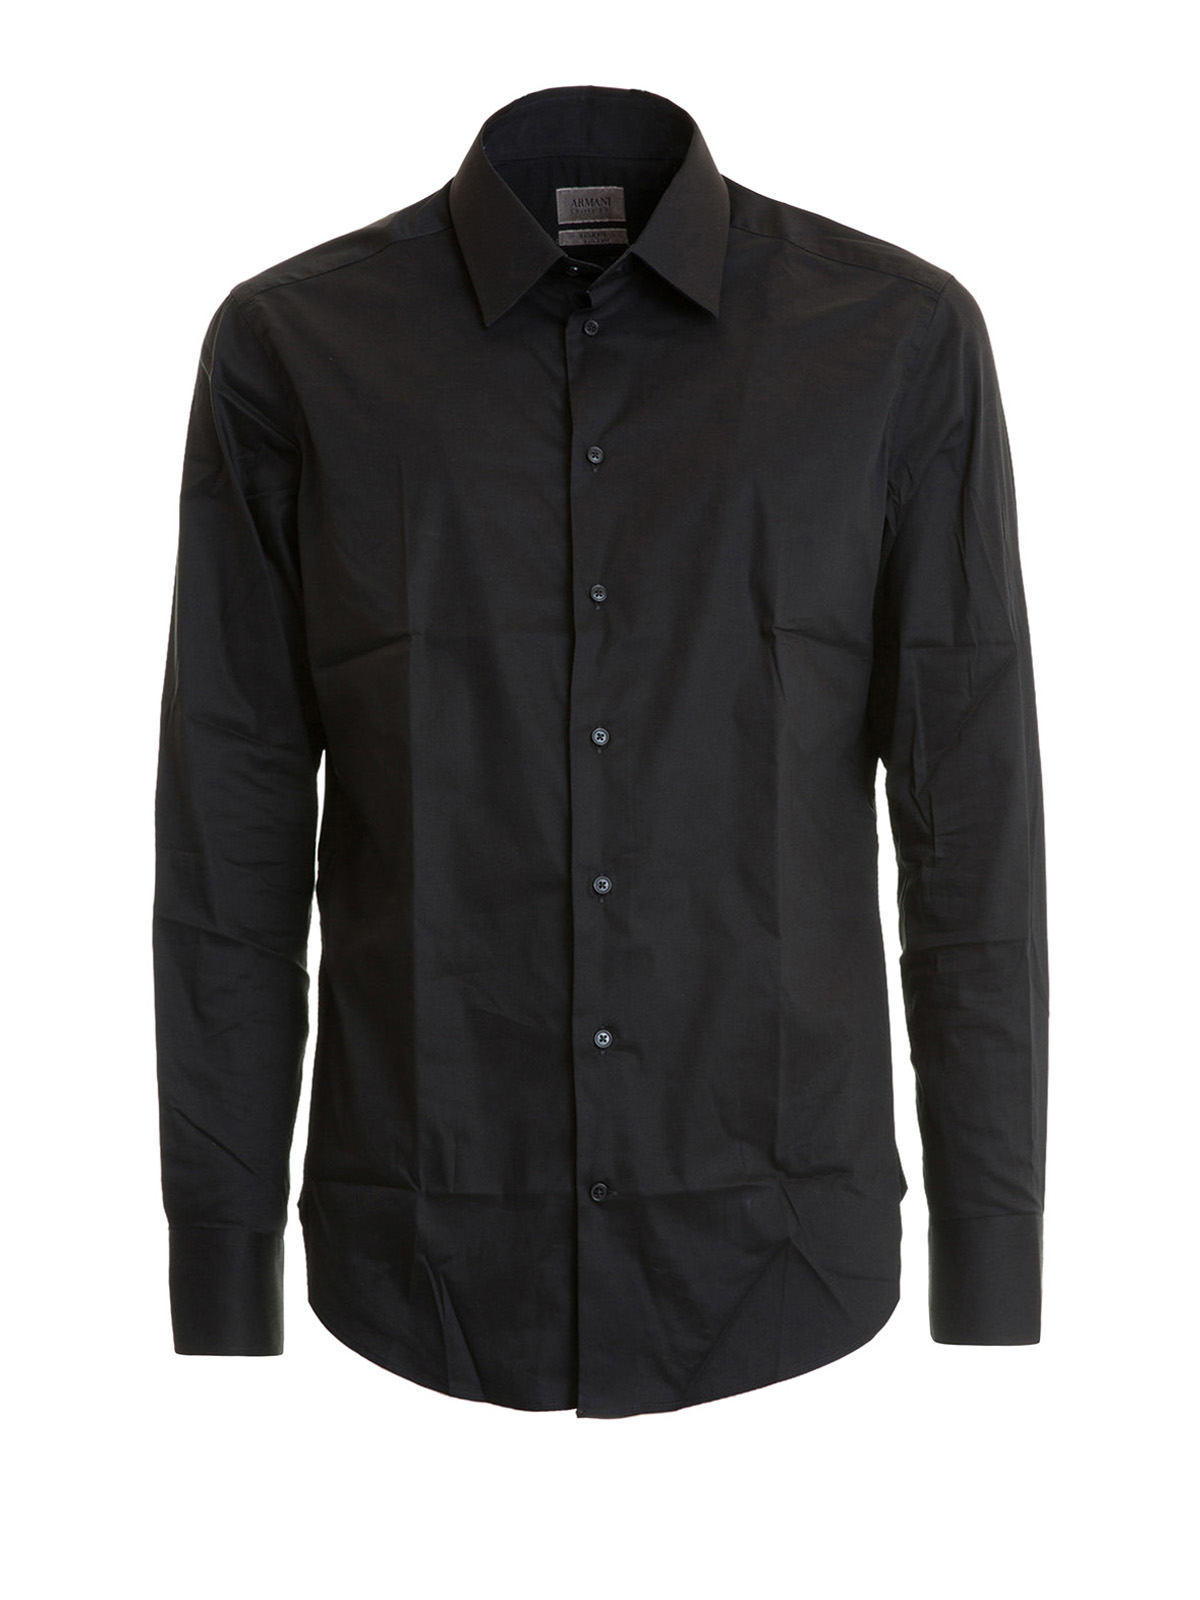 Slim Fit Classic Black Cotton Shirt By Armani Collezioni